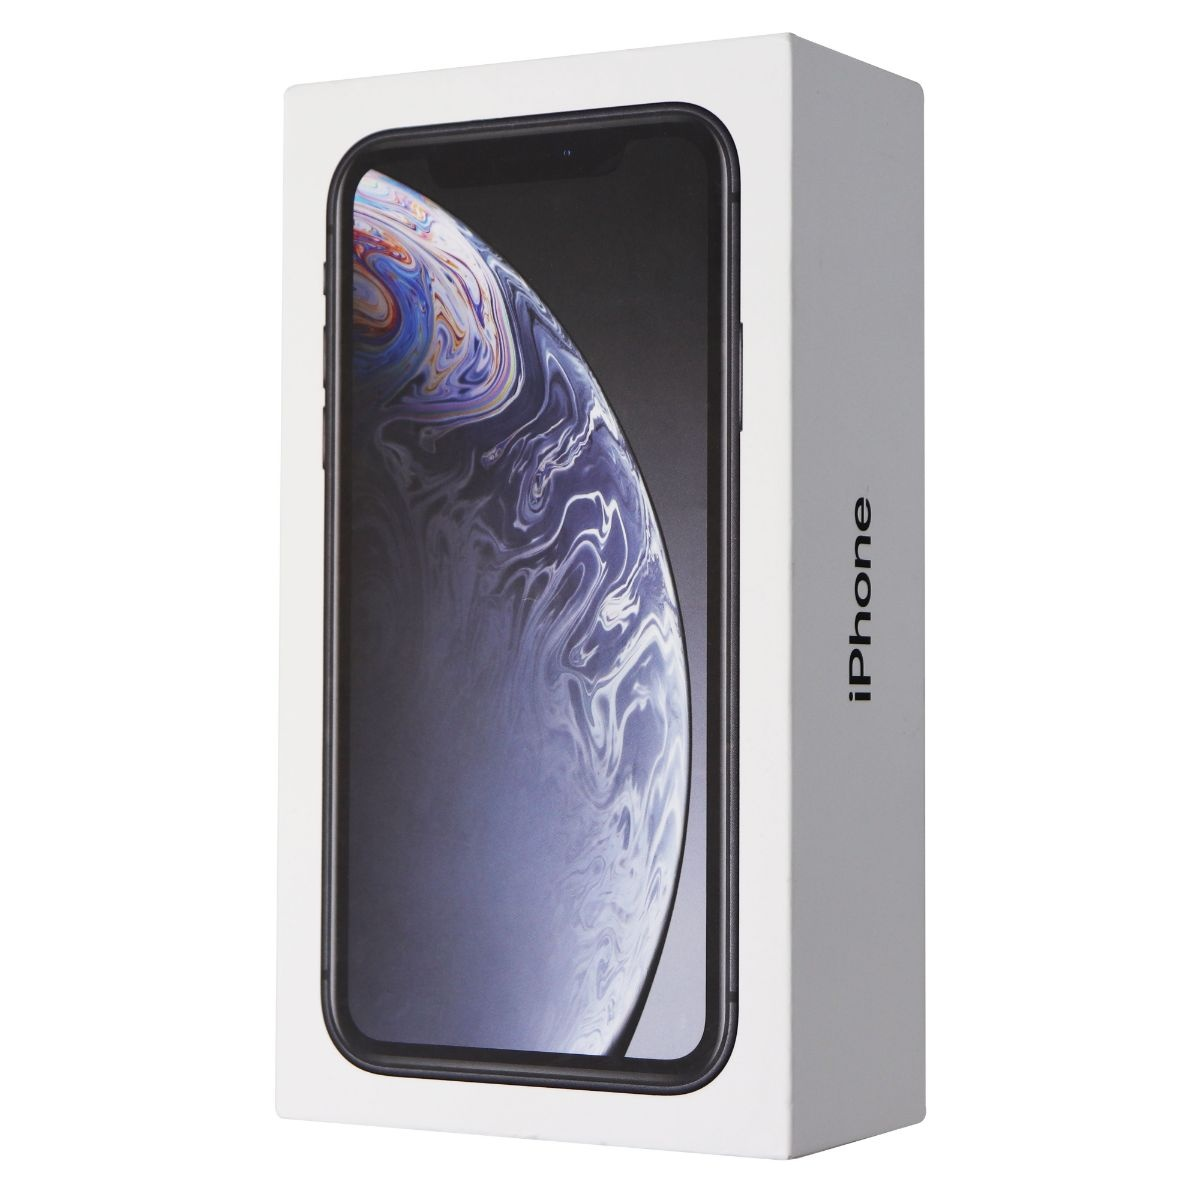 RETAIL BOX - Apple iPhone XR - 64GB / Black - NO DEVICE